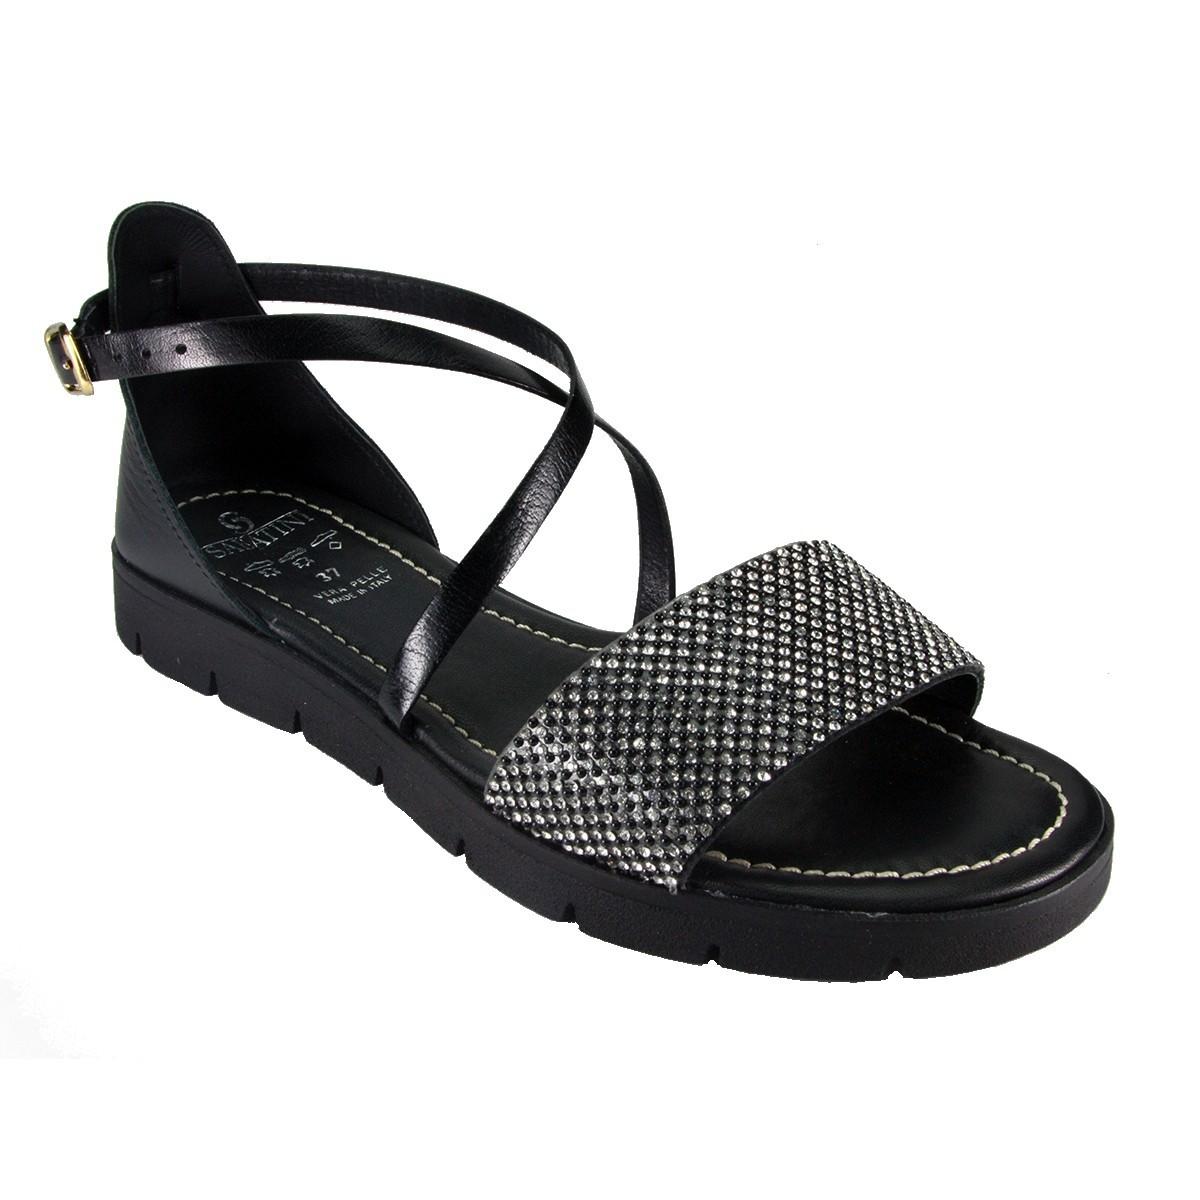 Sabatini S 7100 Nero - Calzatura comoda, elastica e leggera